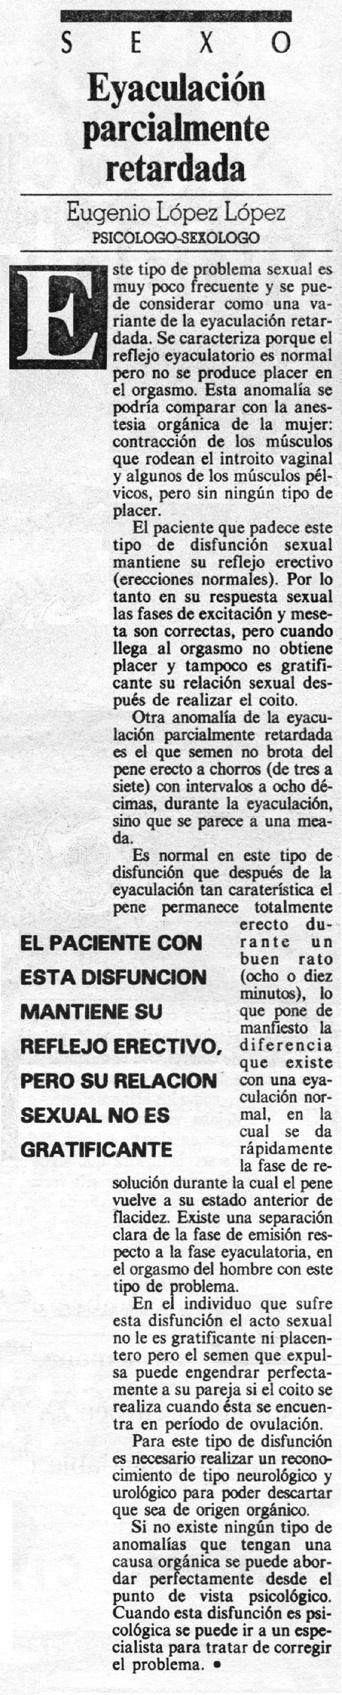 1991-05-19-p